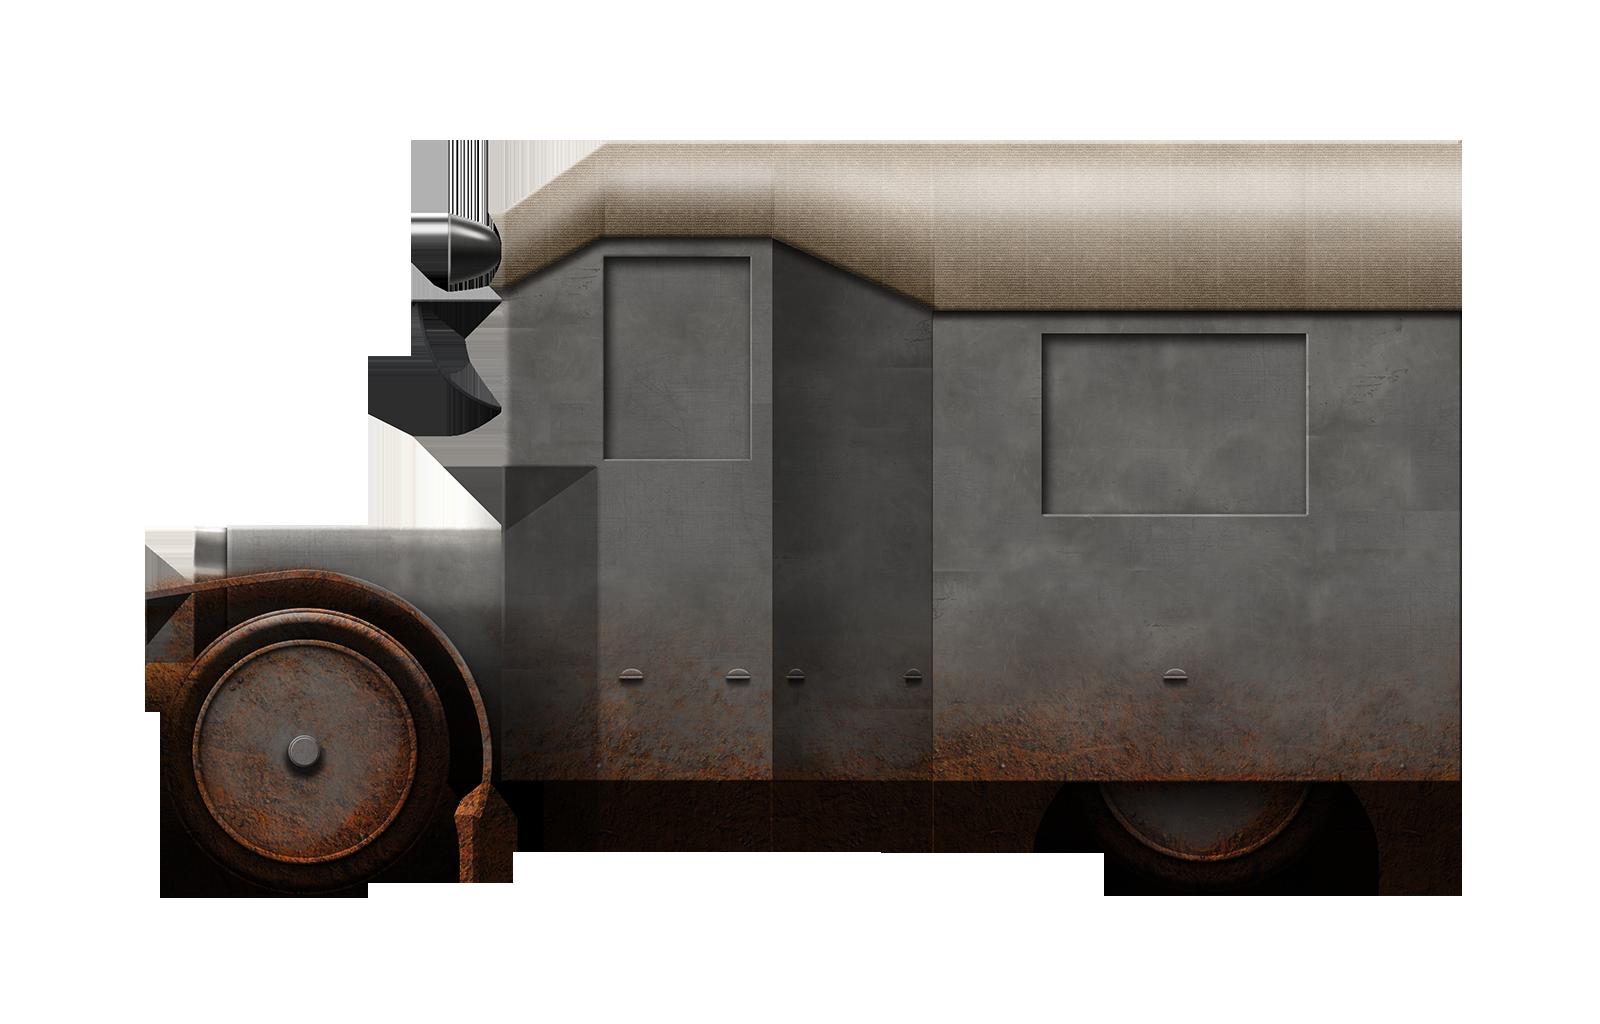 Panzerautomobil Daimler 1909